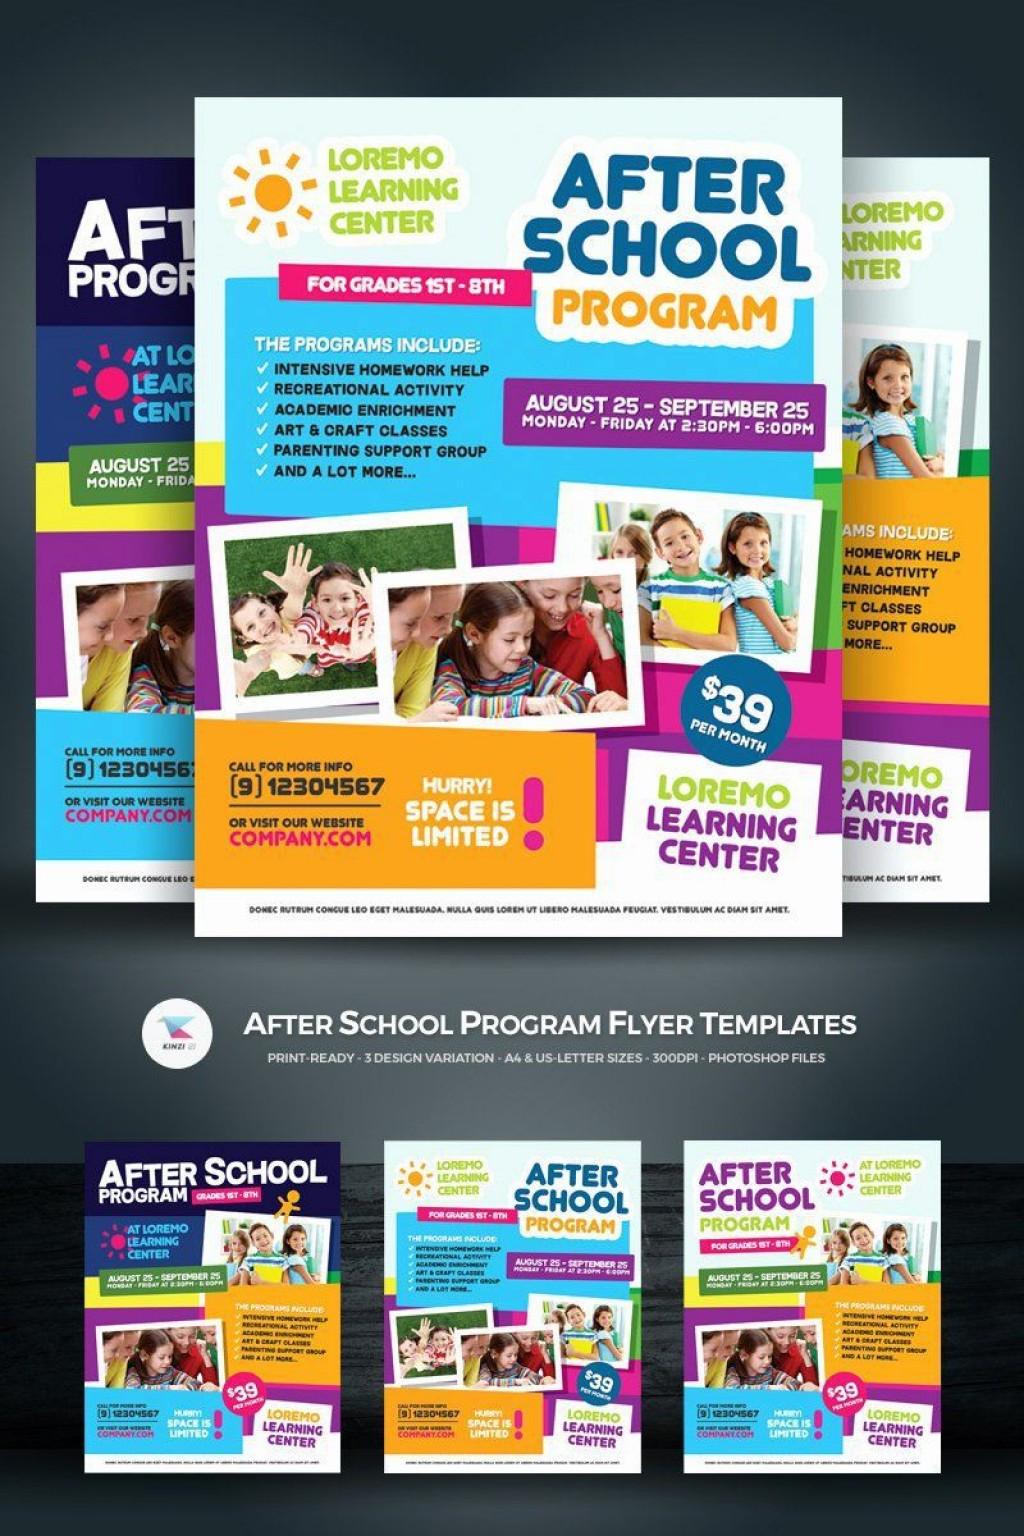 002 Impressive Free After School Flyer Template Image  TemplatesLarge